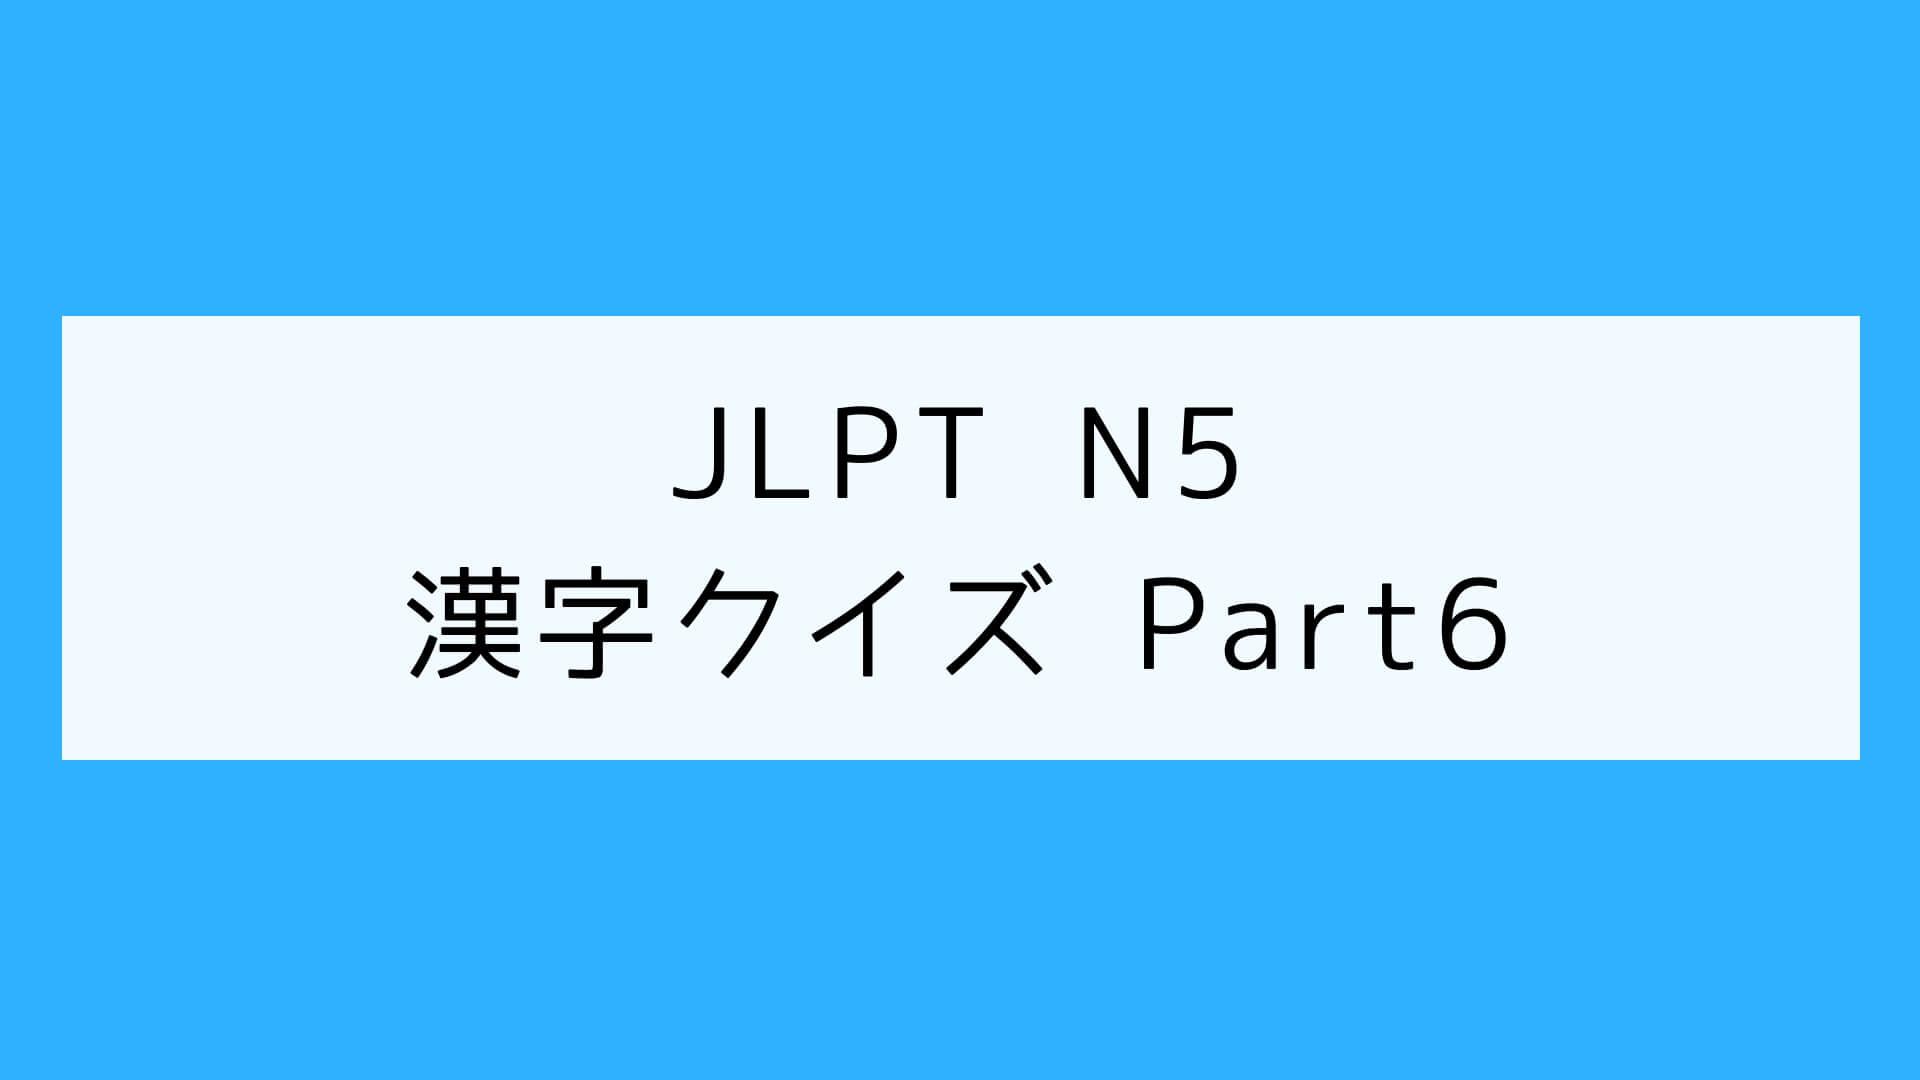 【JLPT N5】漢字クイズ Part6